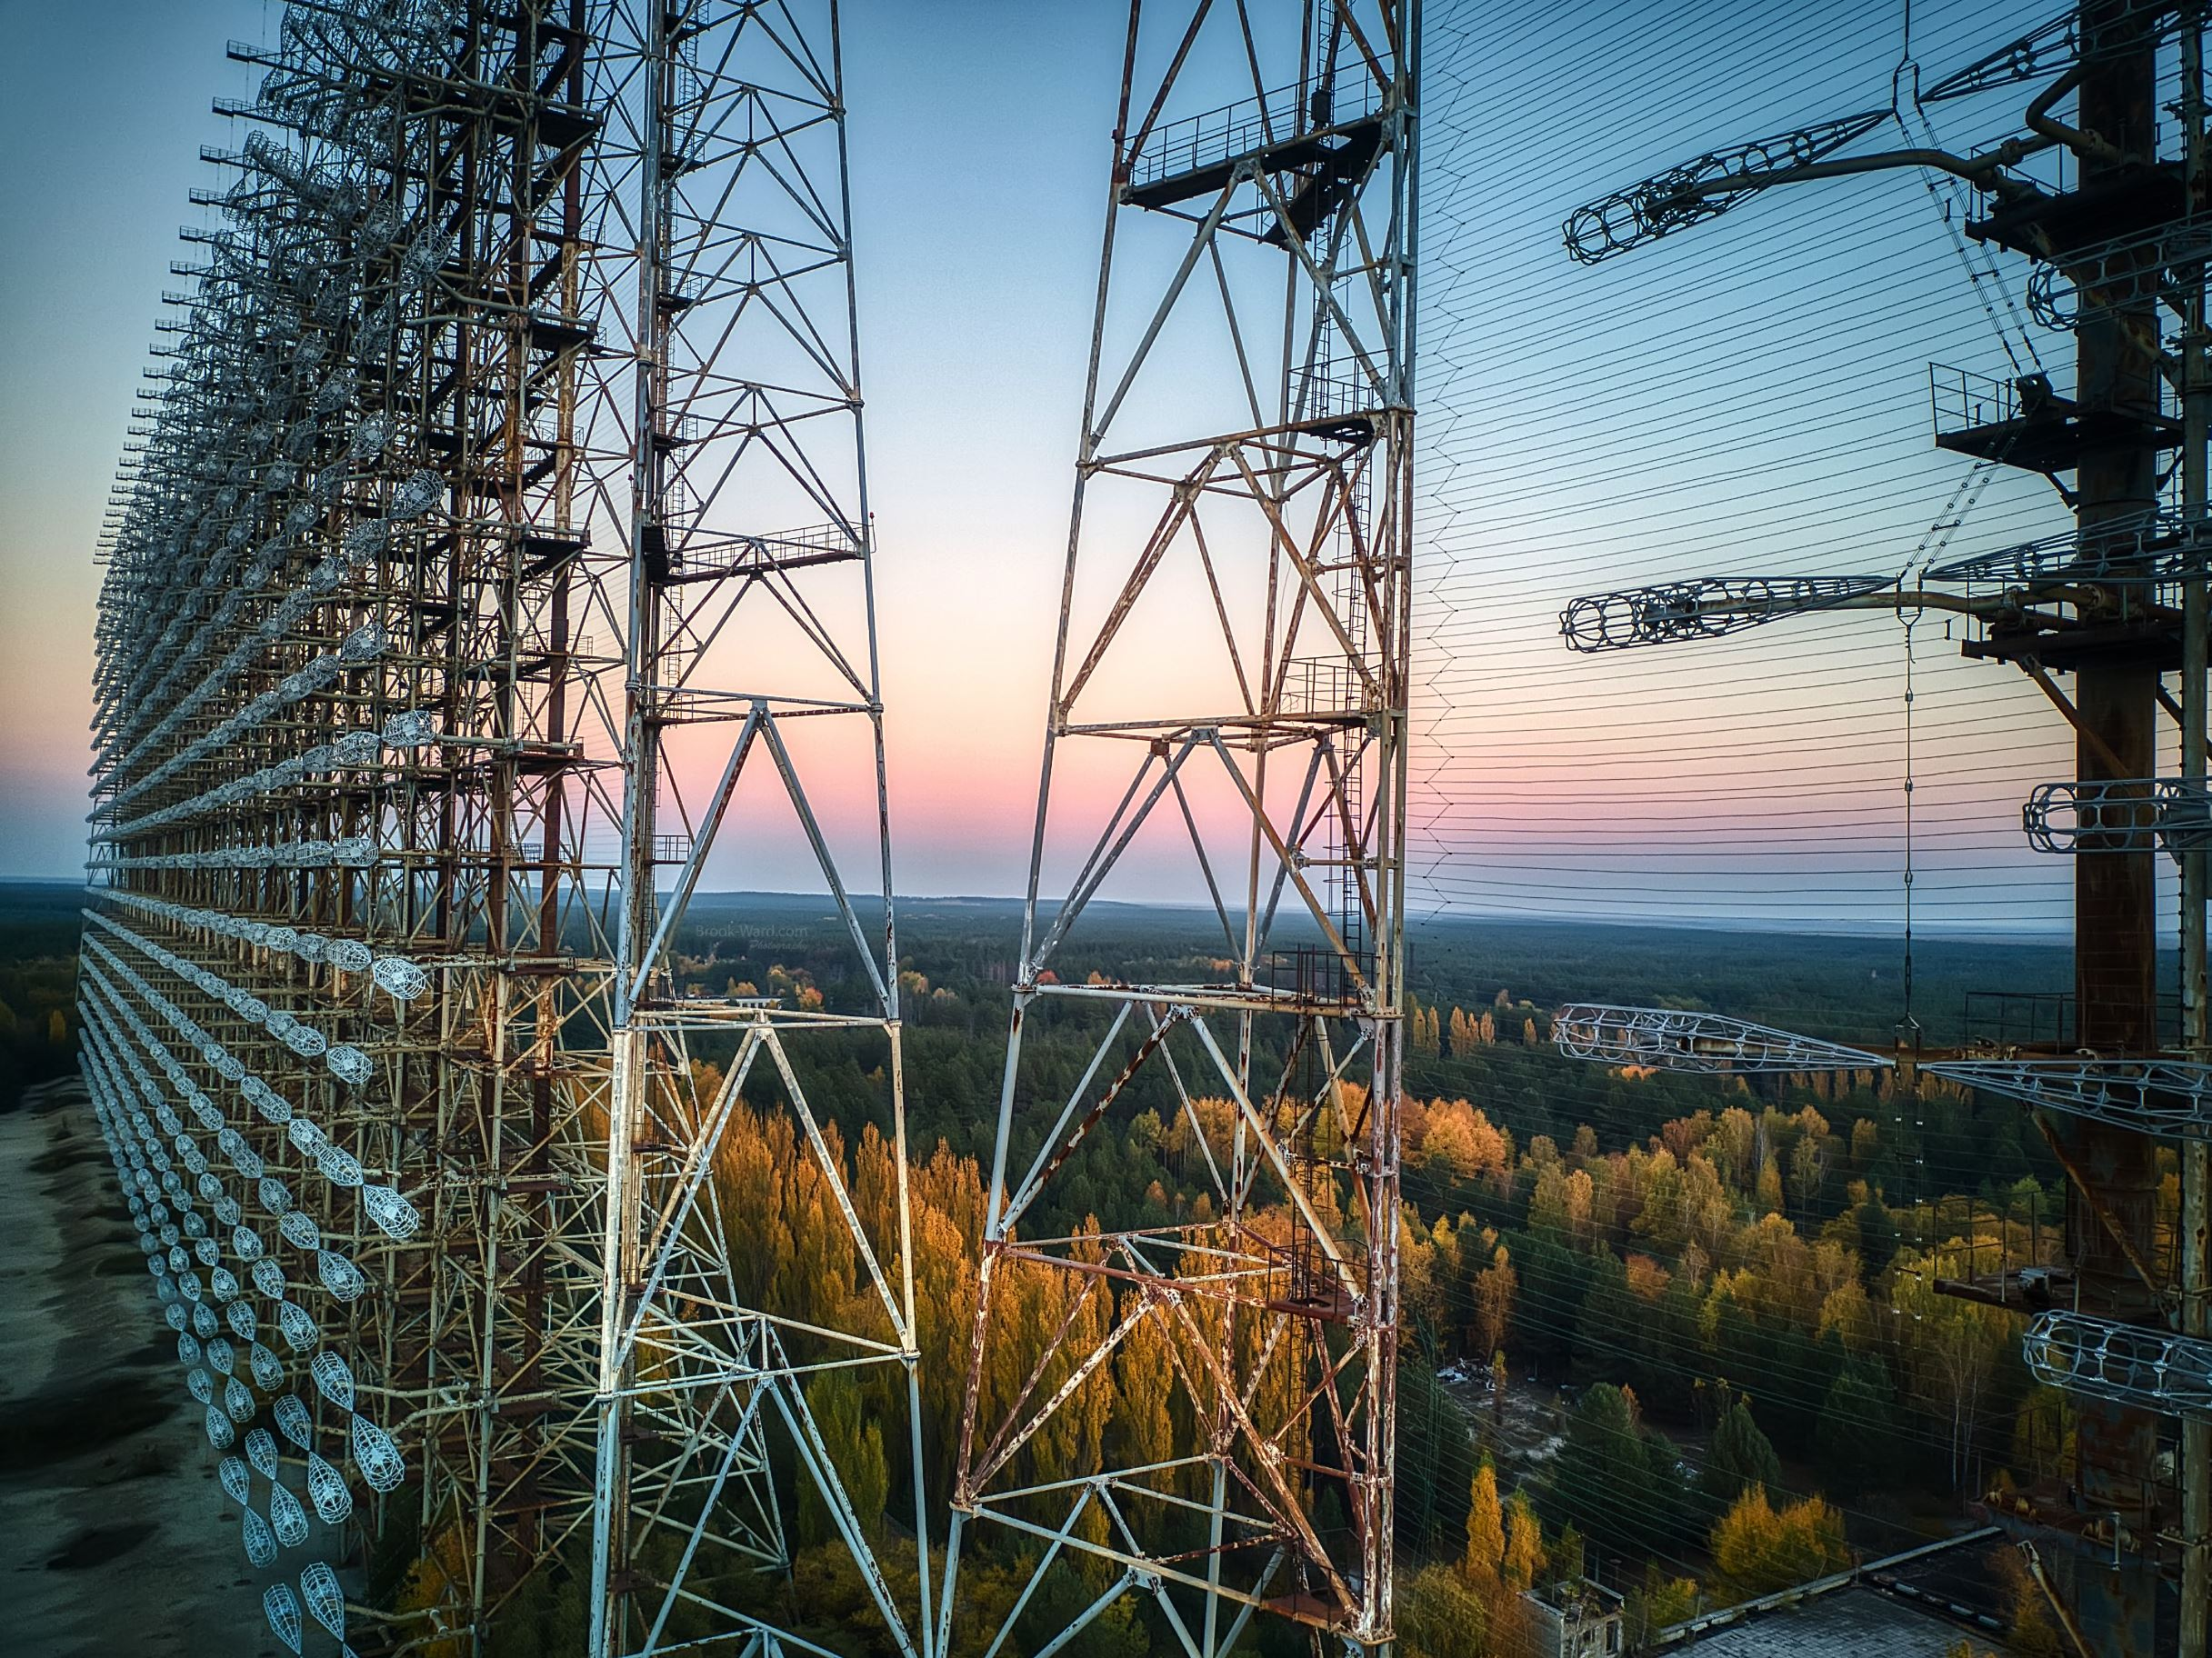 Duga - Chernobyl